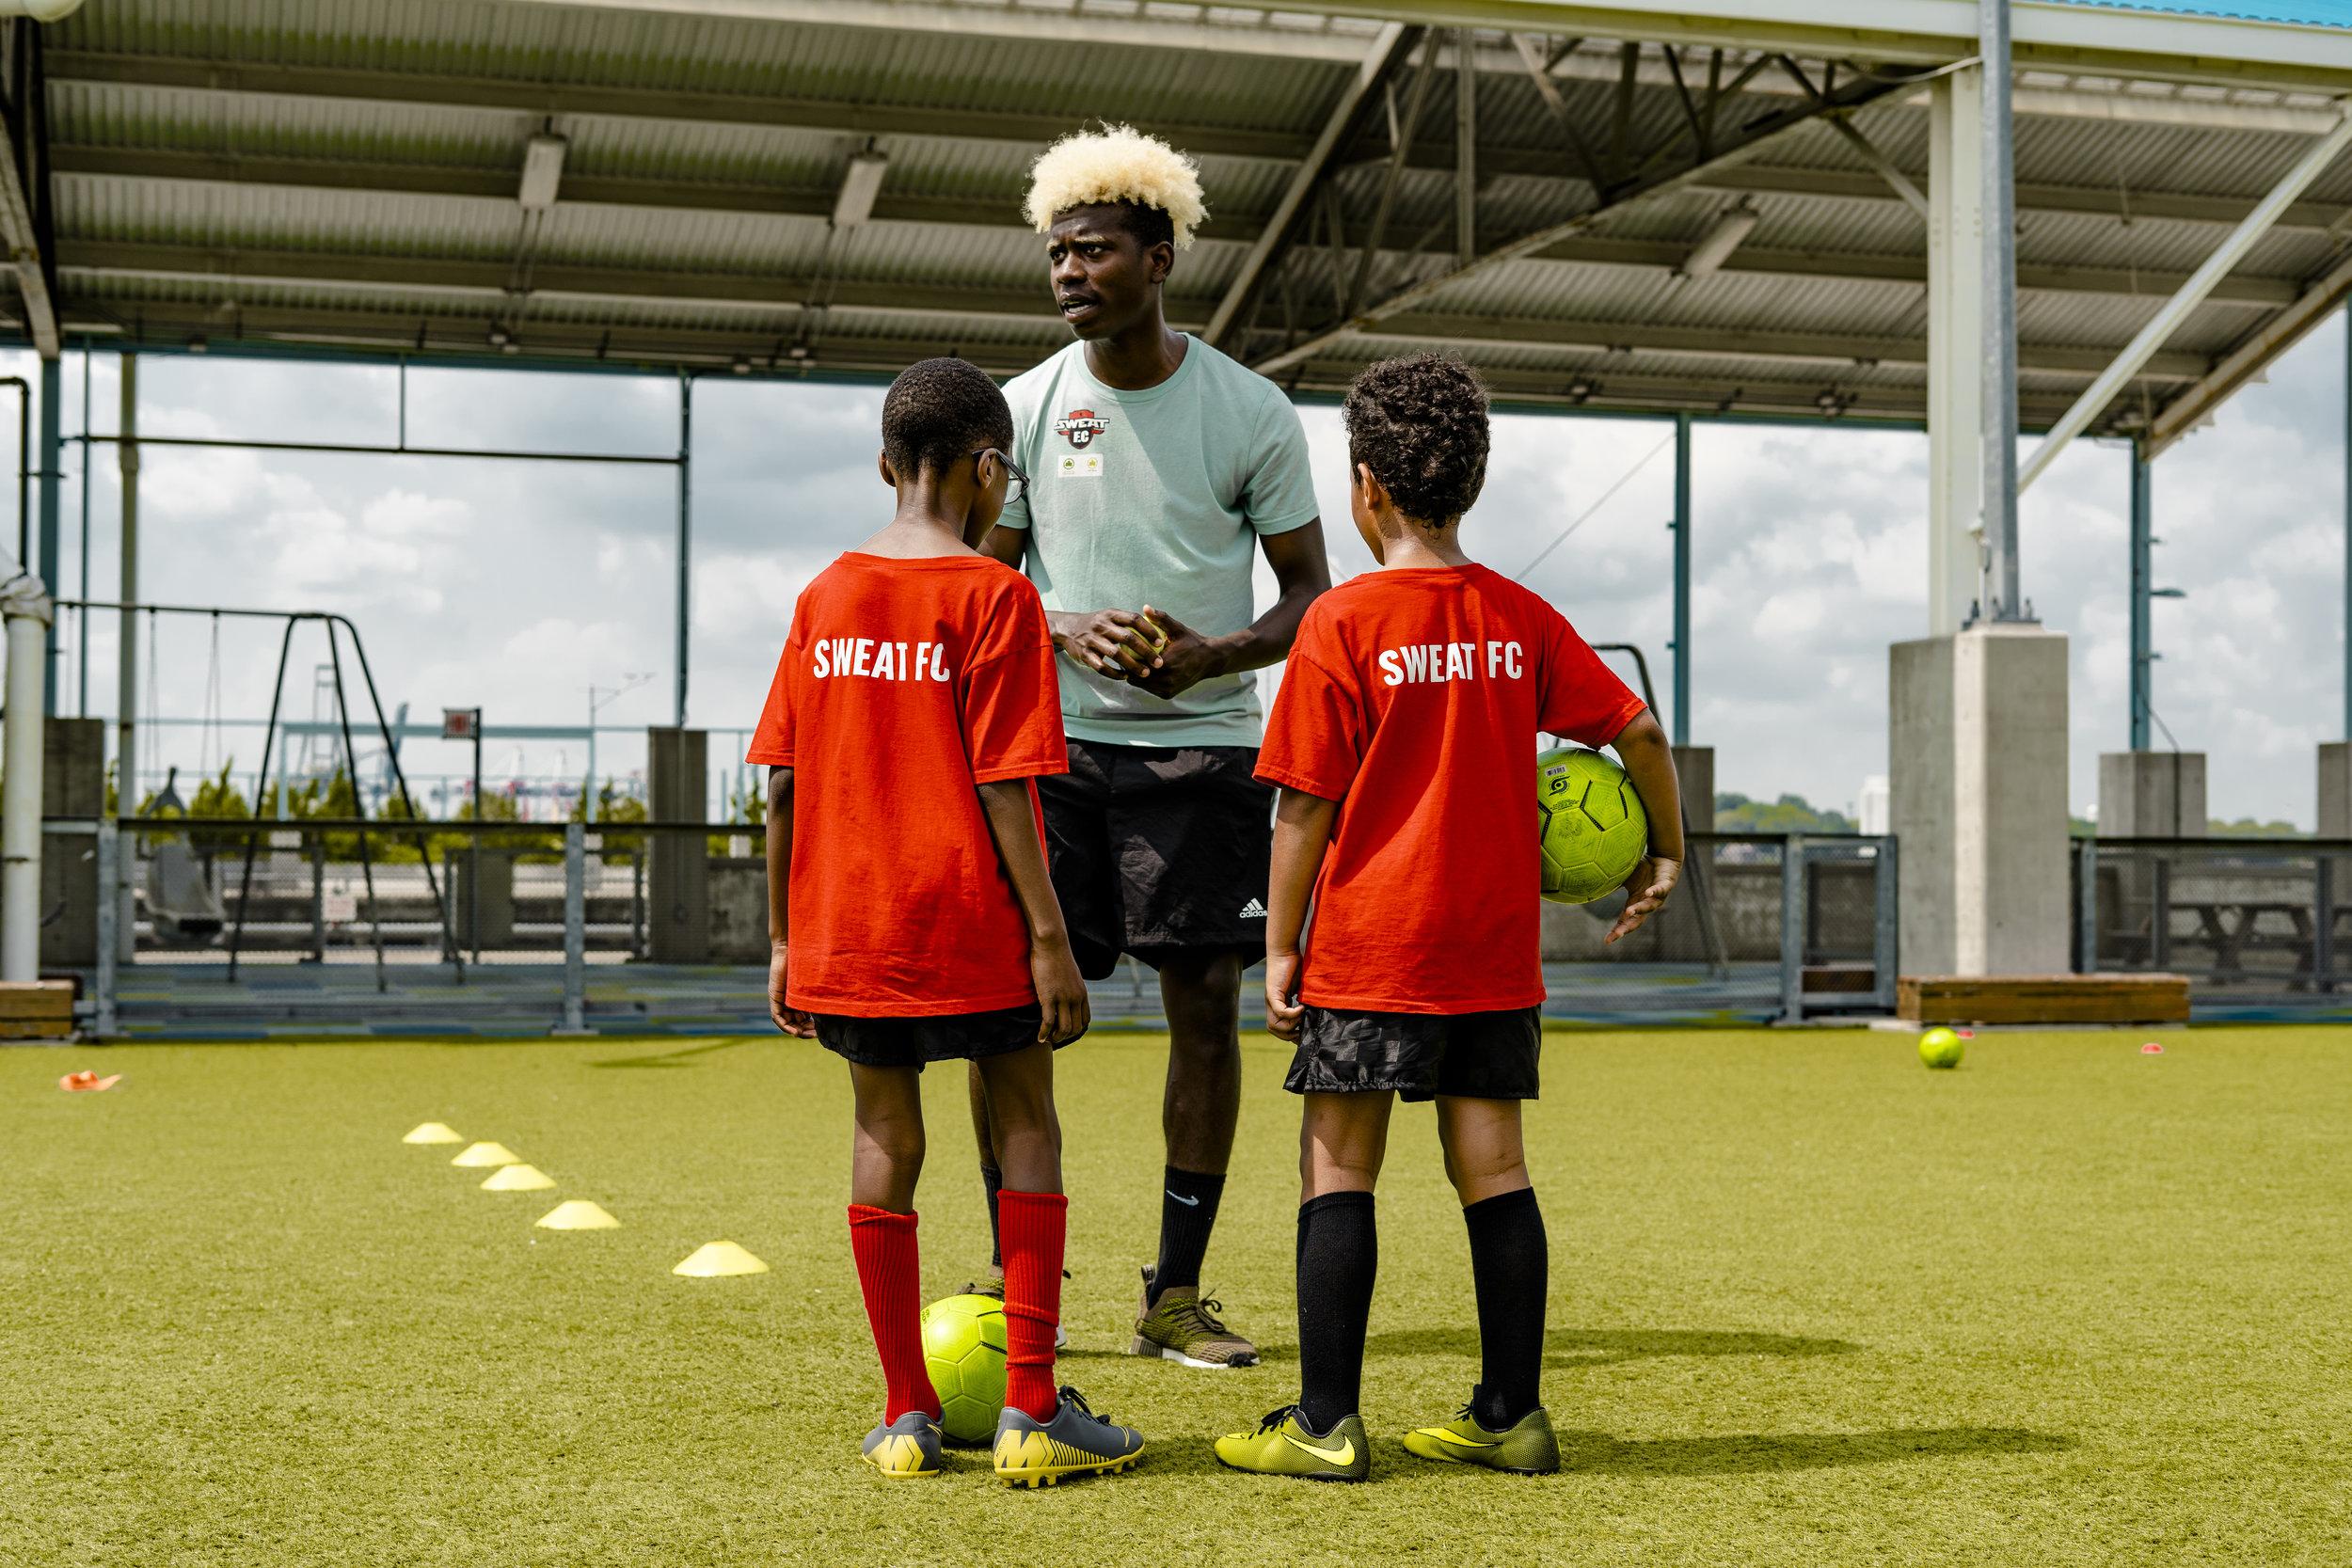 Sweat F.C: Soccer School